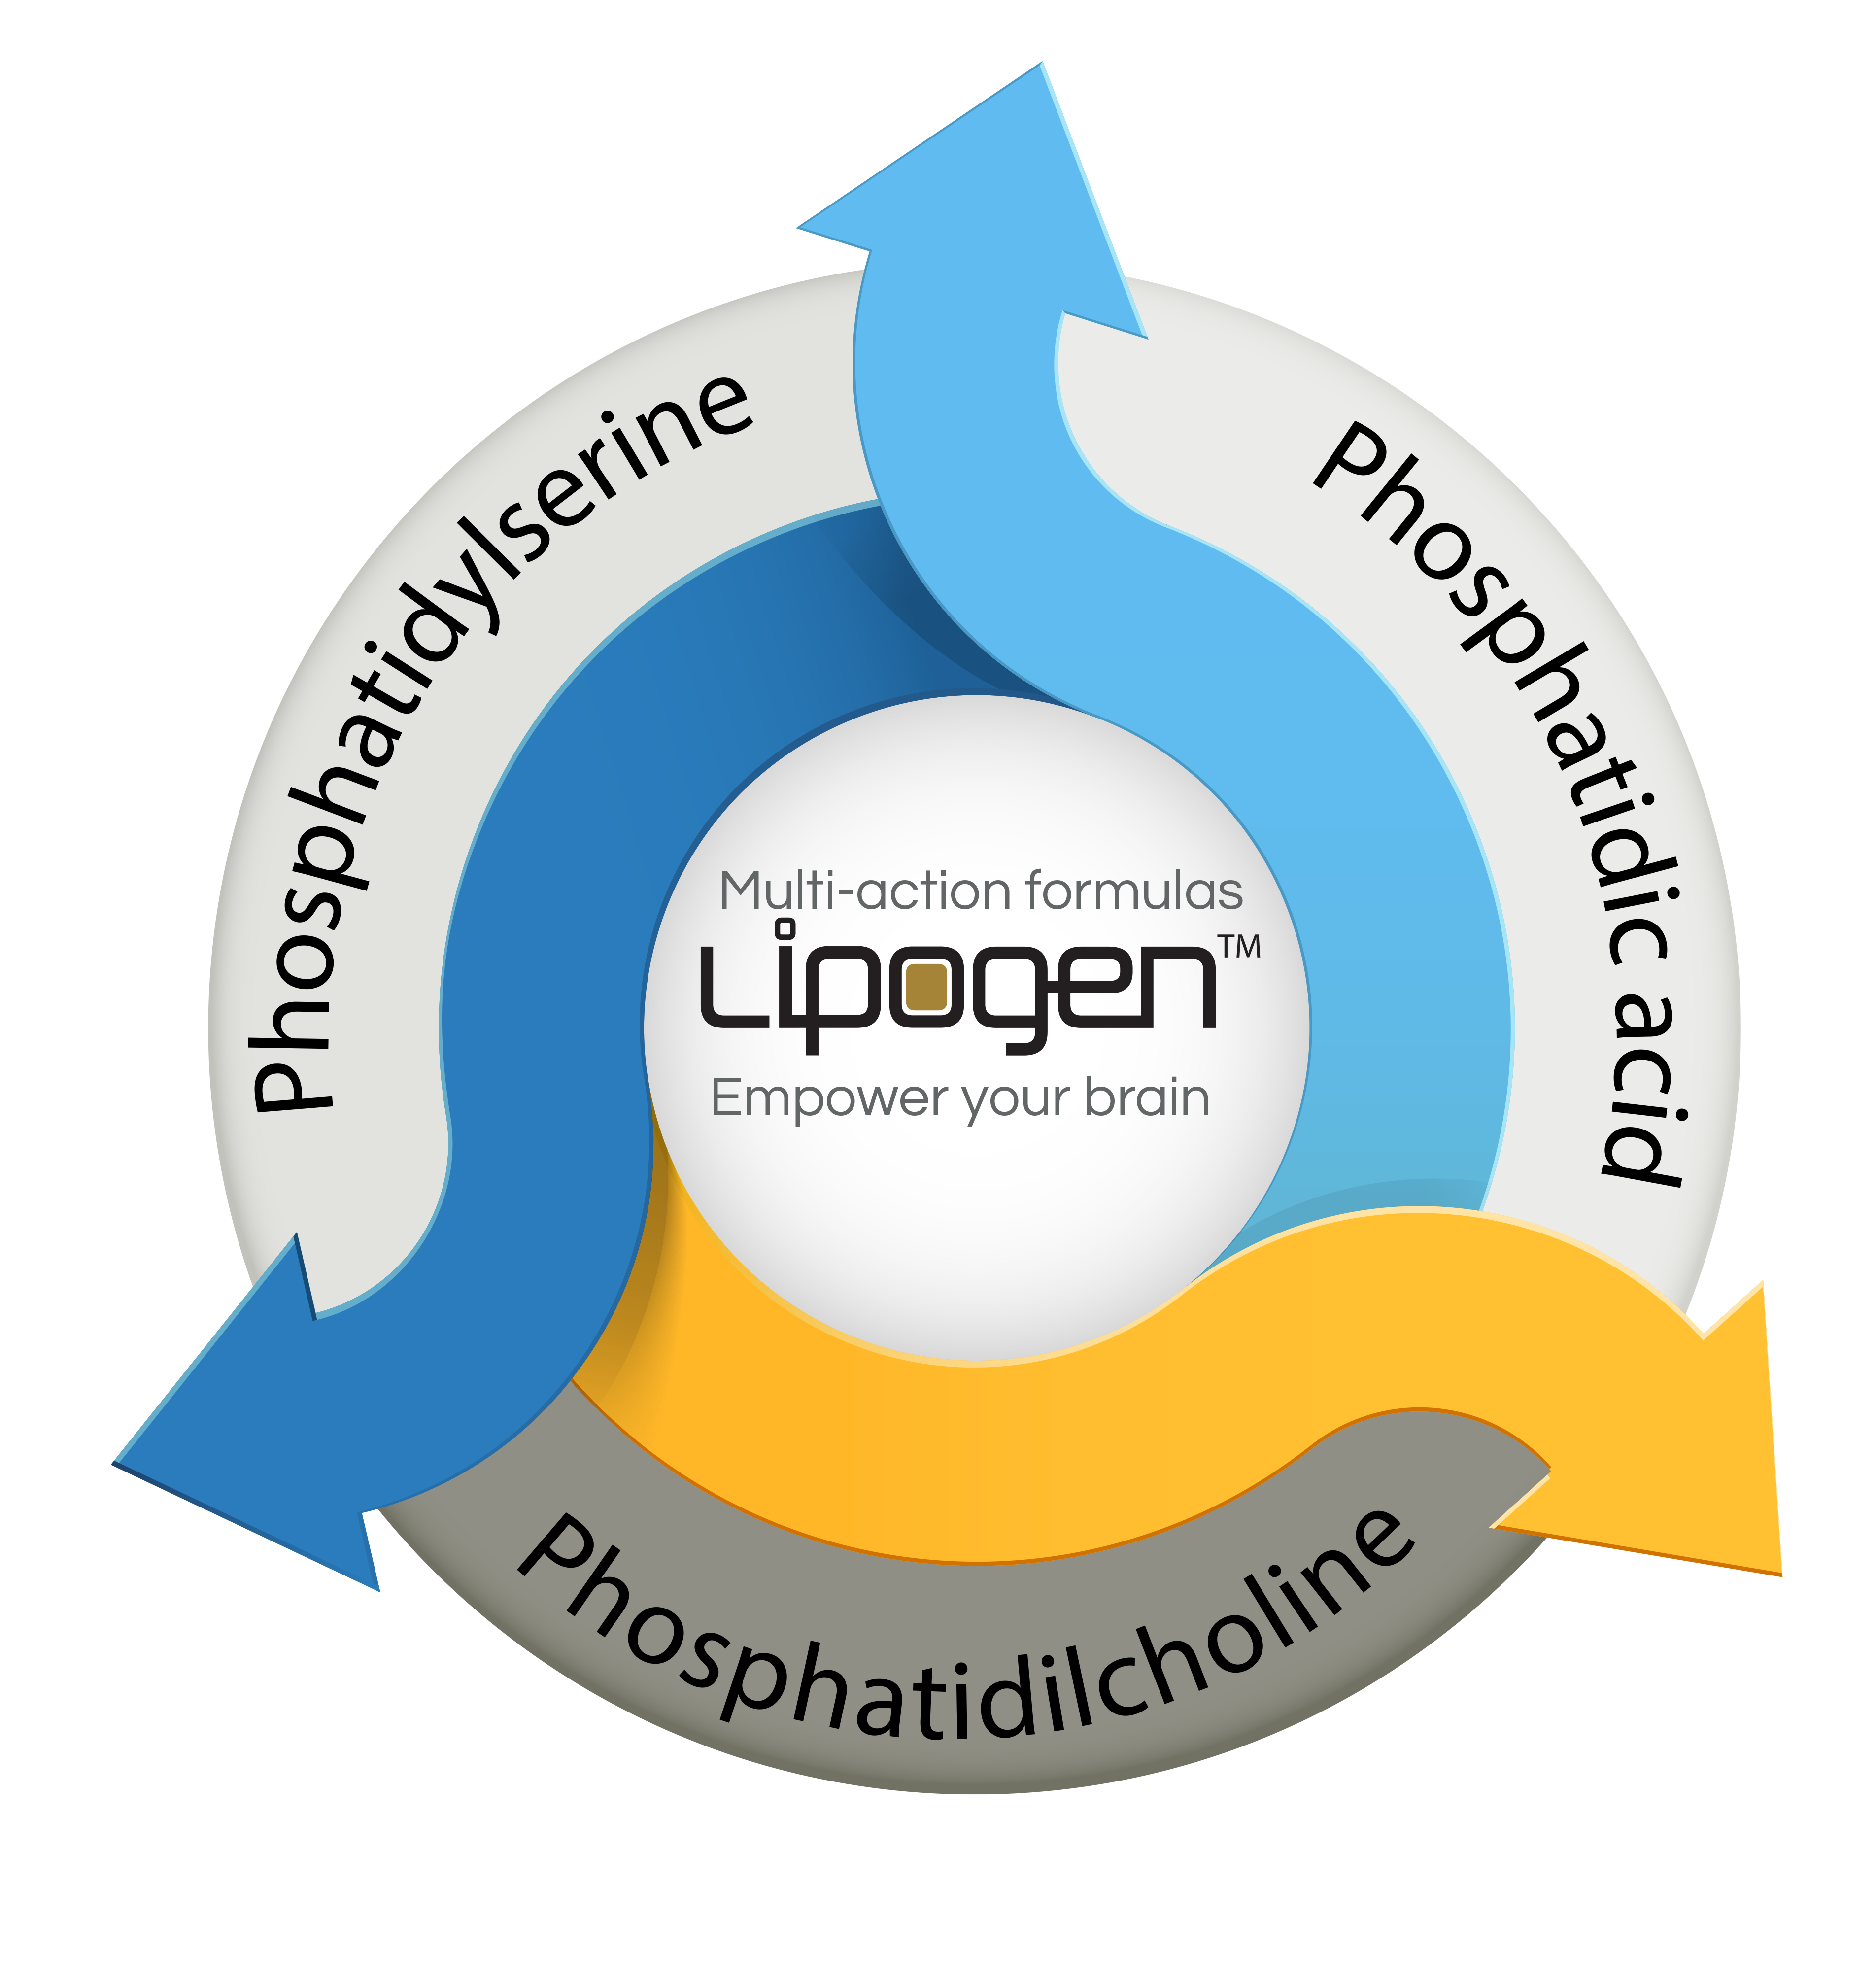 lipogen_image1